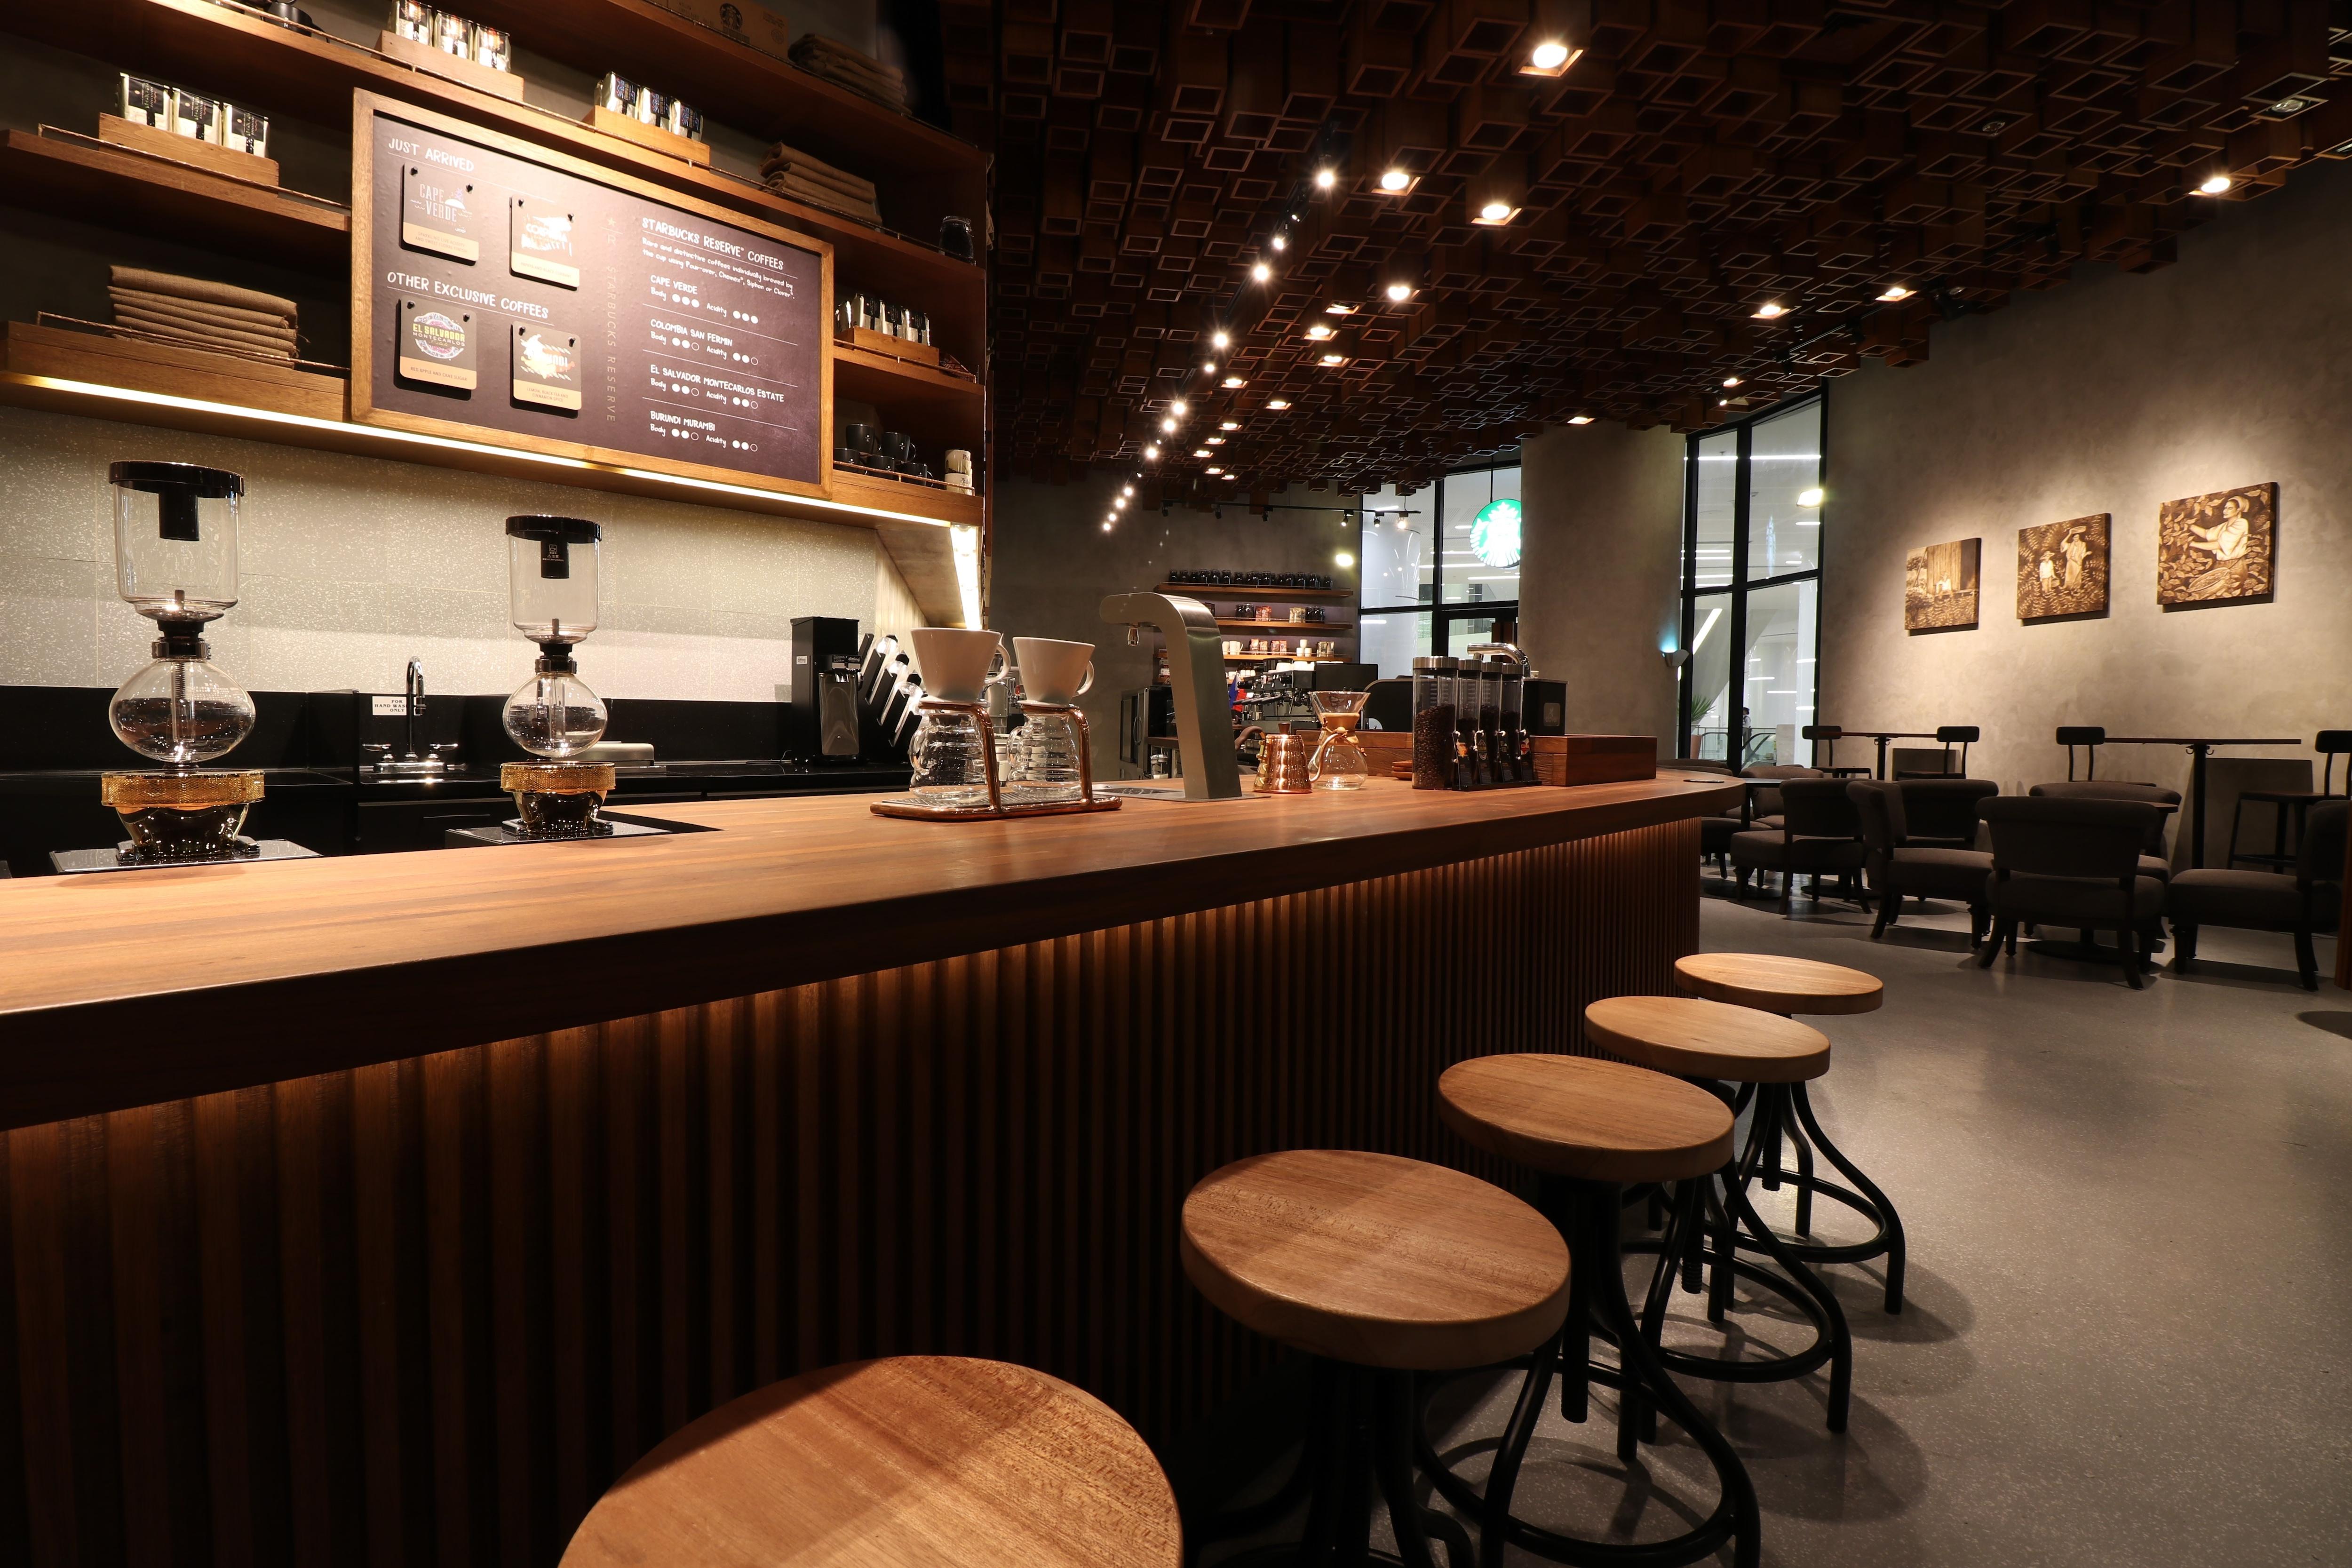 Bar Design Pour Maison coffee experience bar | starbucks coffee company